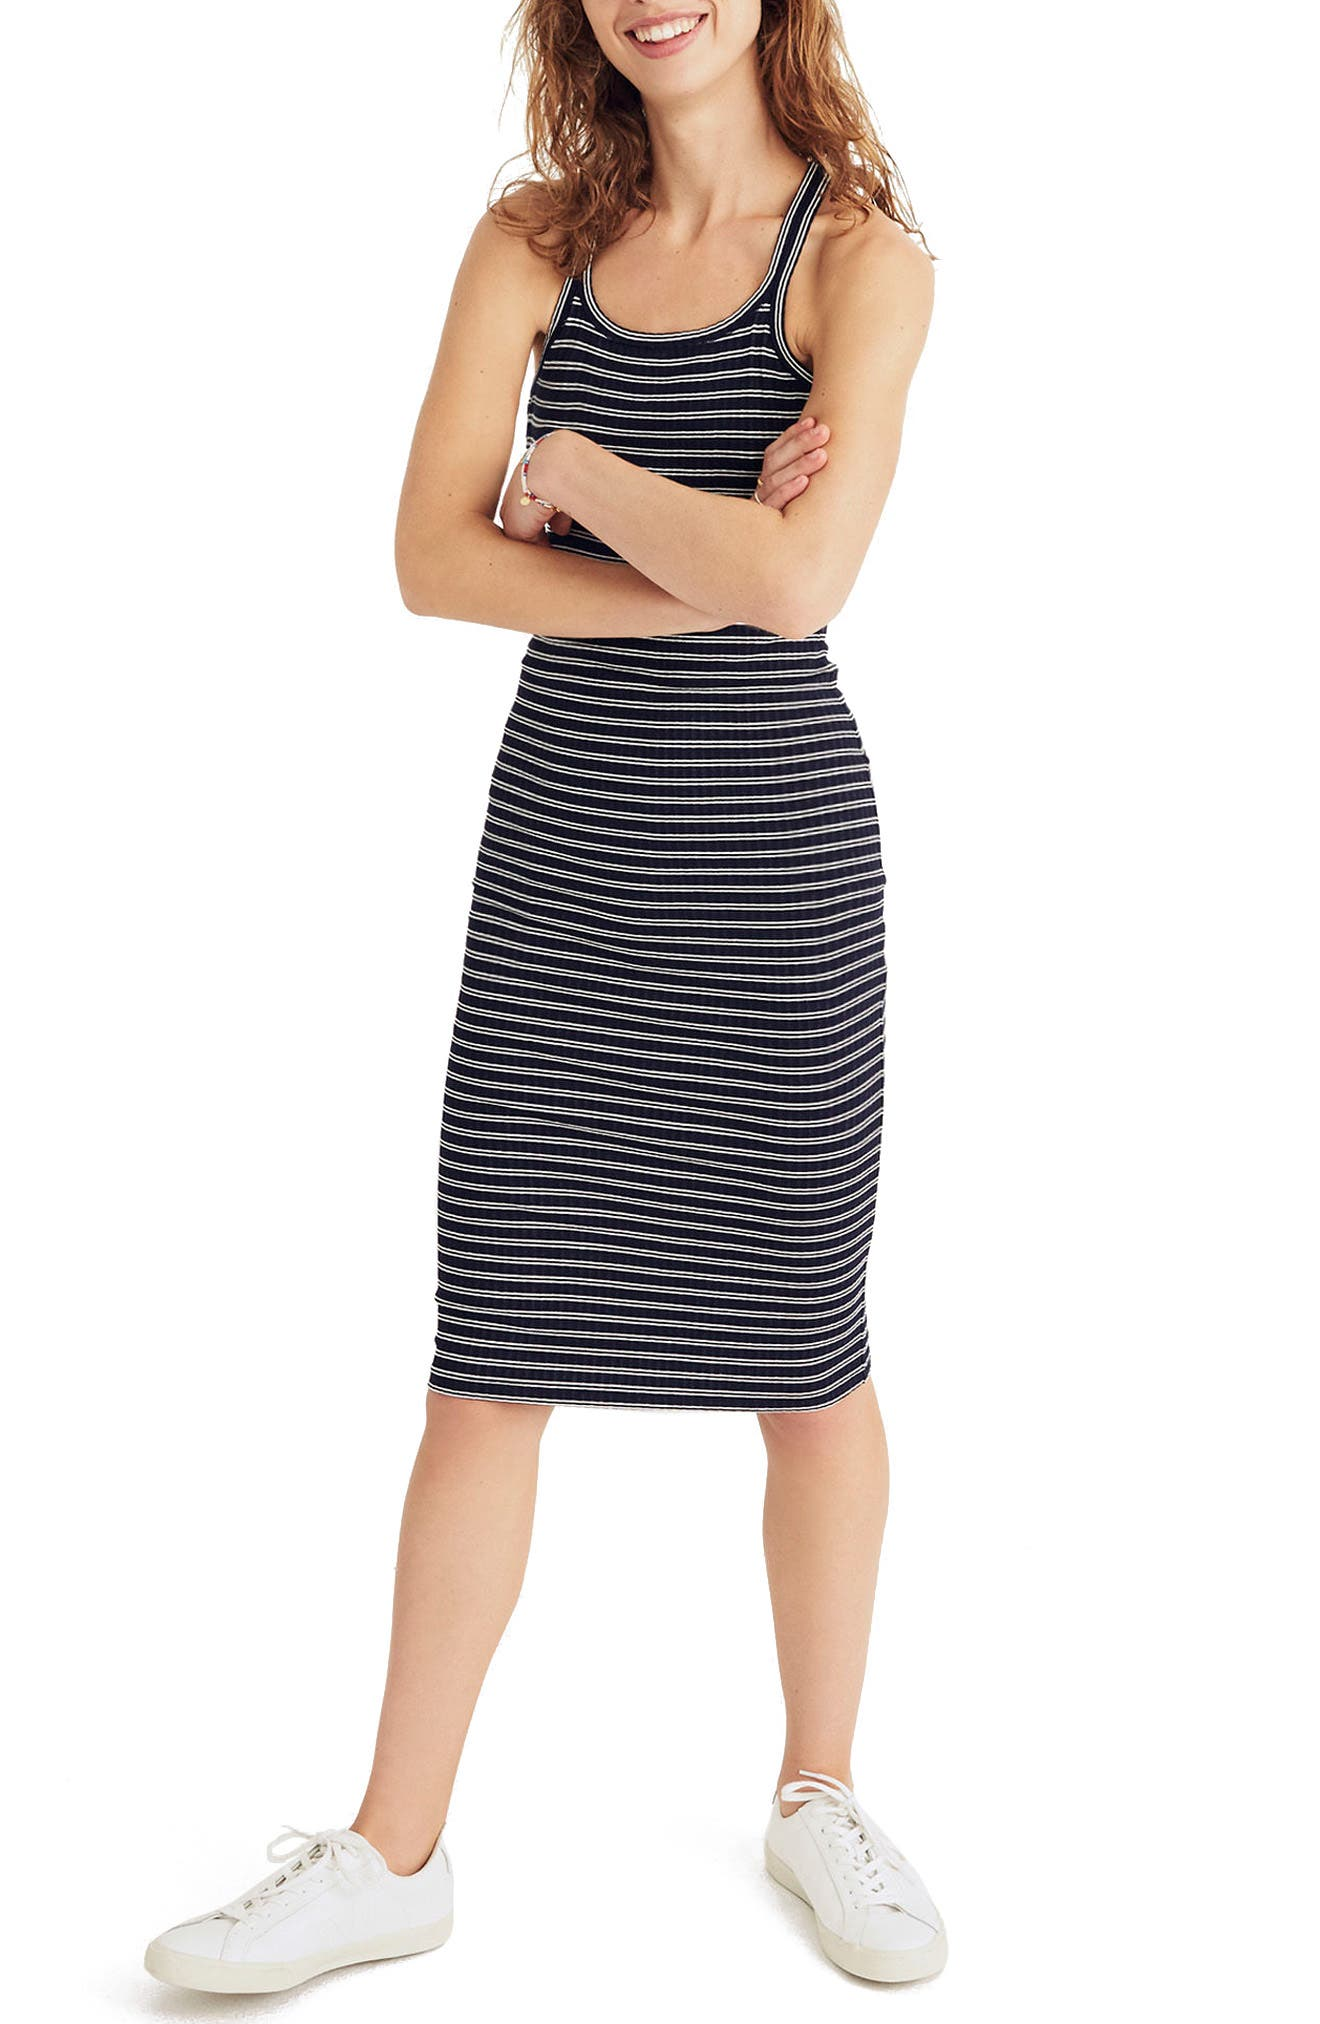 MADEWELL Striped Racerback Midi Dress, Main, color, 400